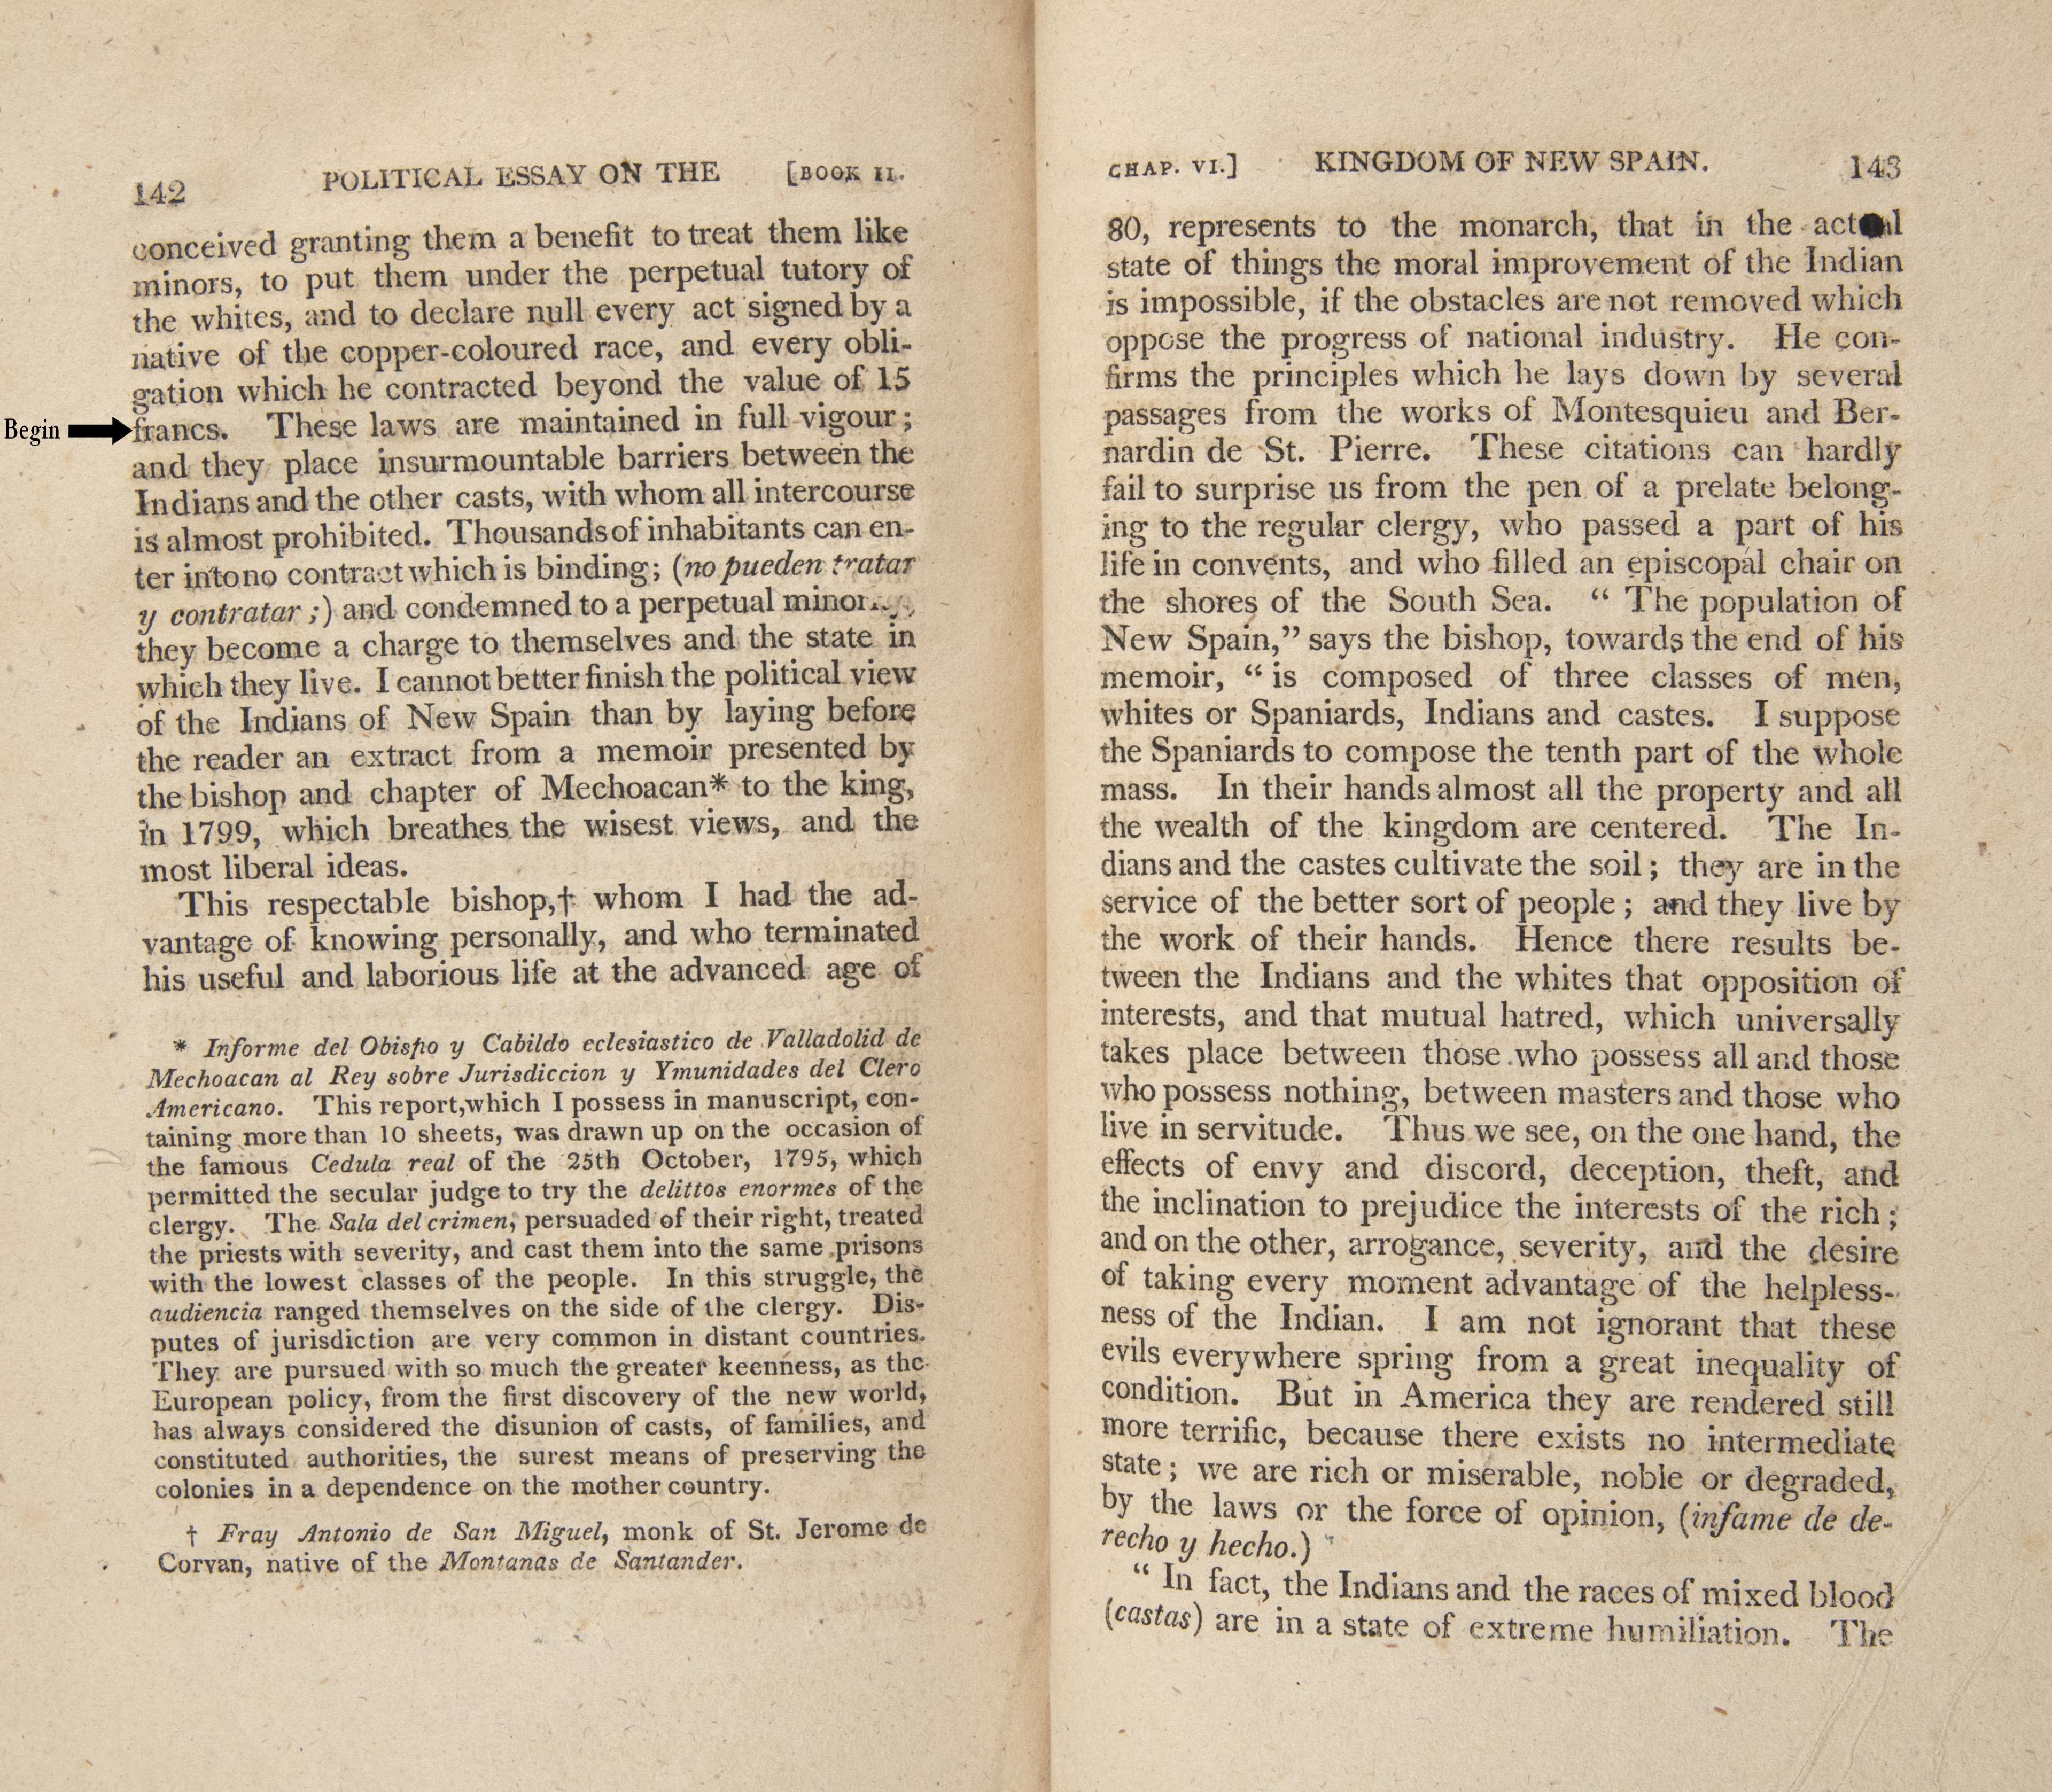 018 Von Humboldt Political Essay Pp142 143 Mod Example Dreaded Crossword Puzzle Clue Full